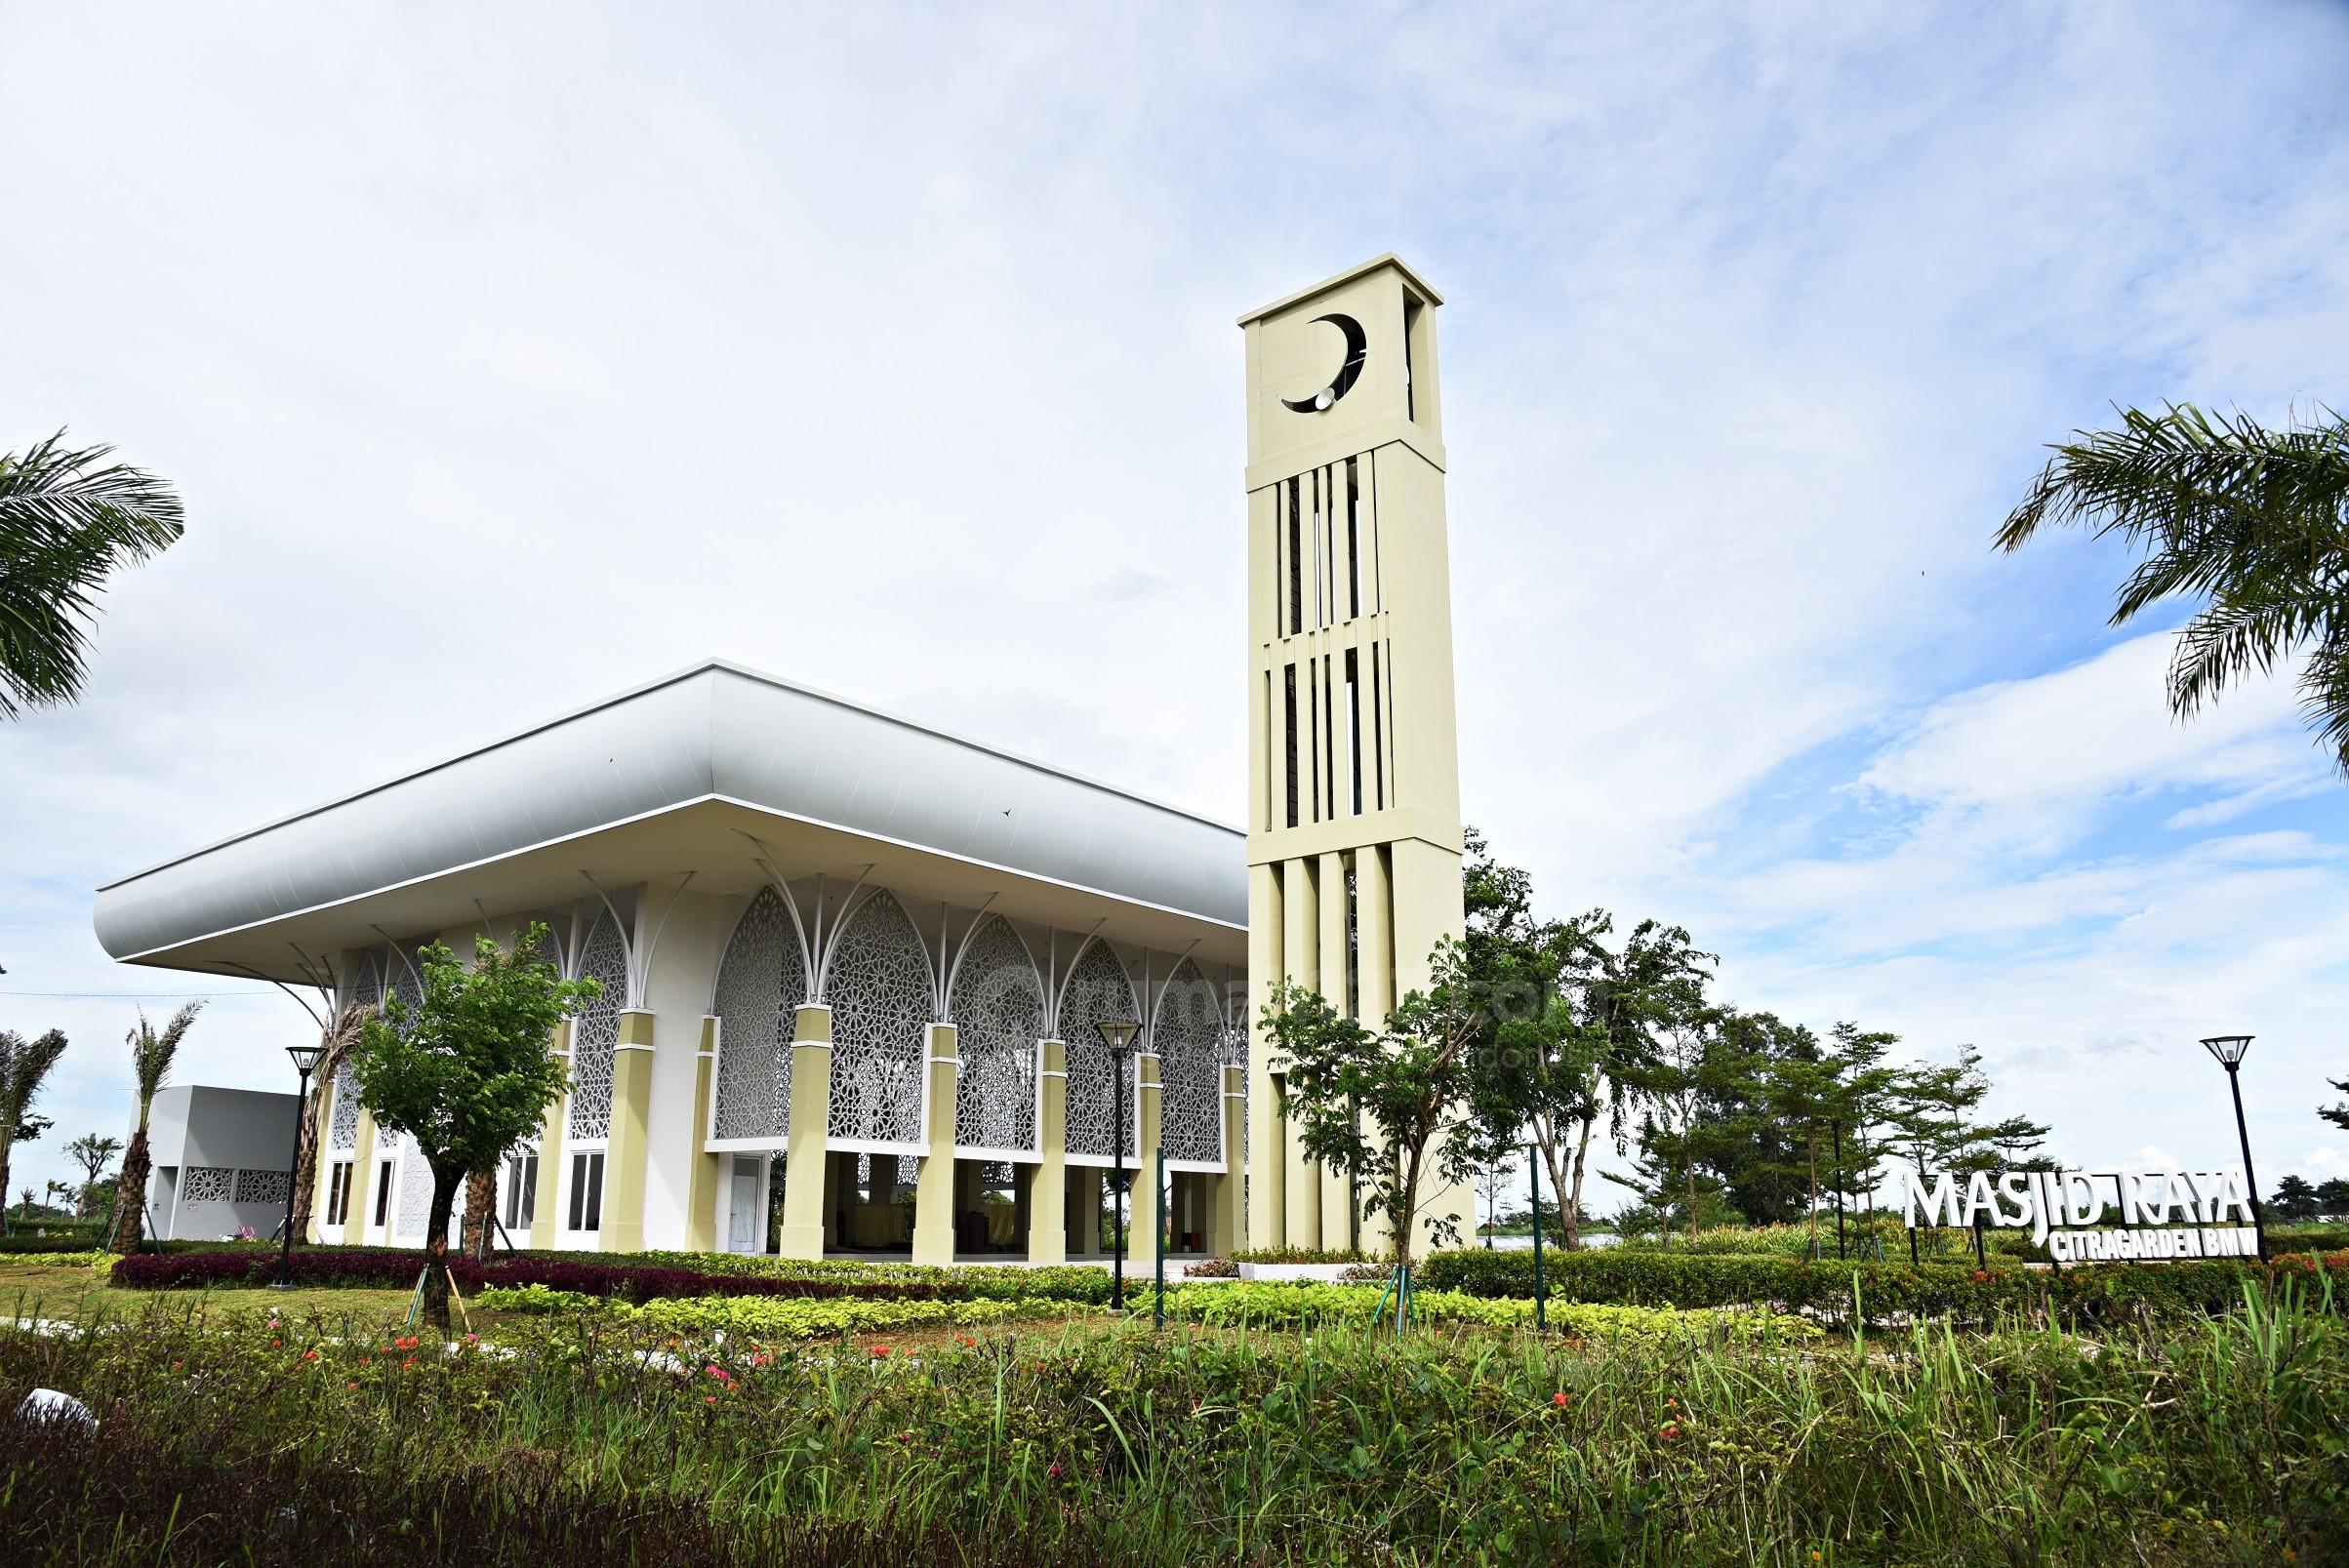 CitraGarden BMW Optimistis Naikan Nilai Investasi dengan Bangun Masjid